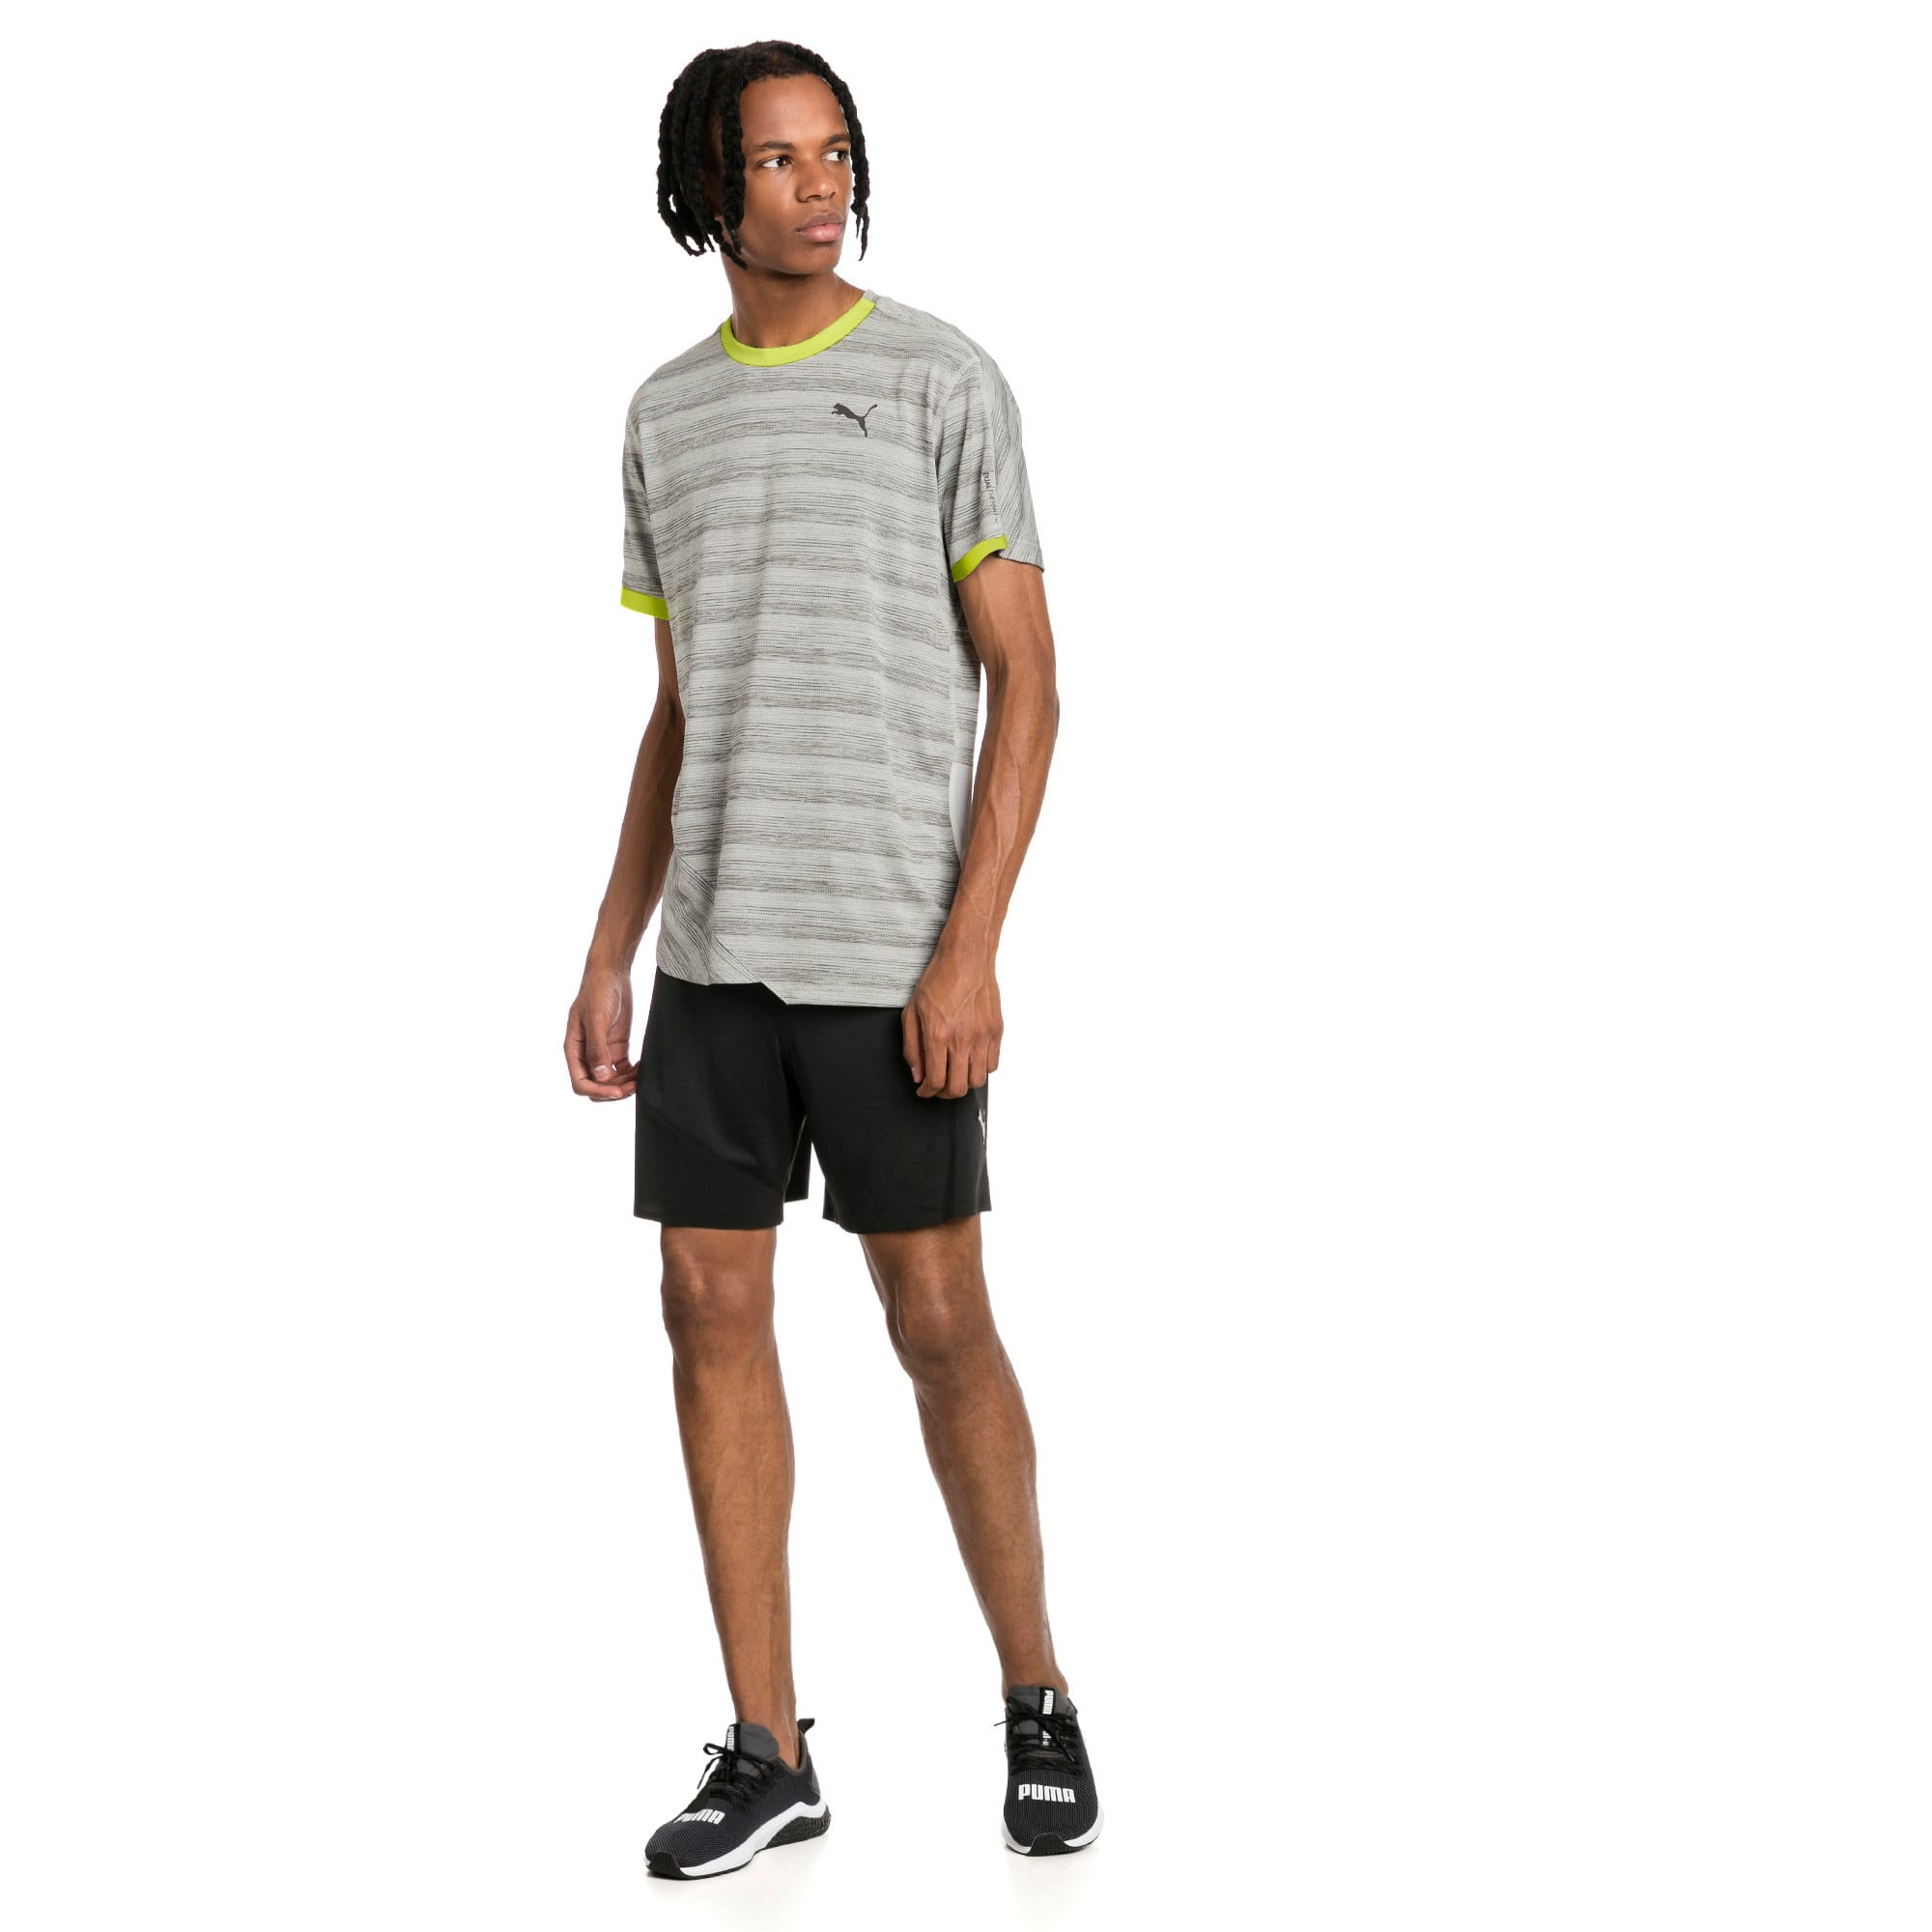 Thumbnail 3 of PACE Breeze Men's Shorts, Puma Black, medium